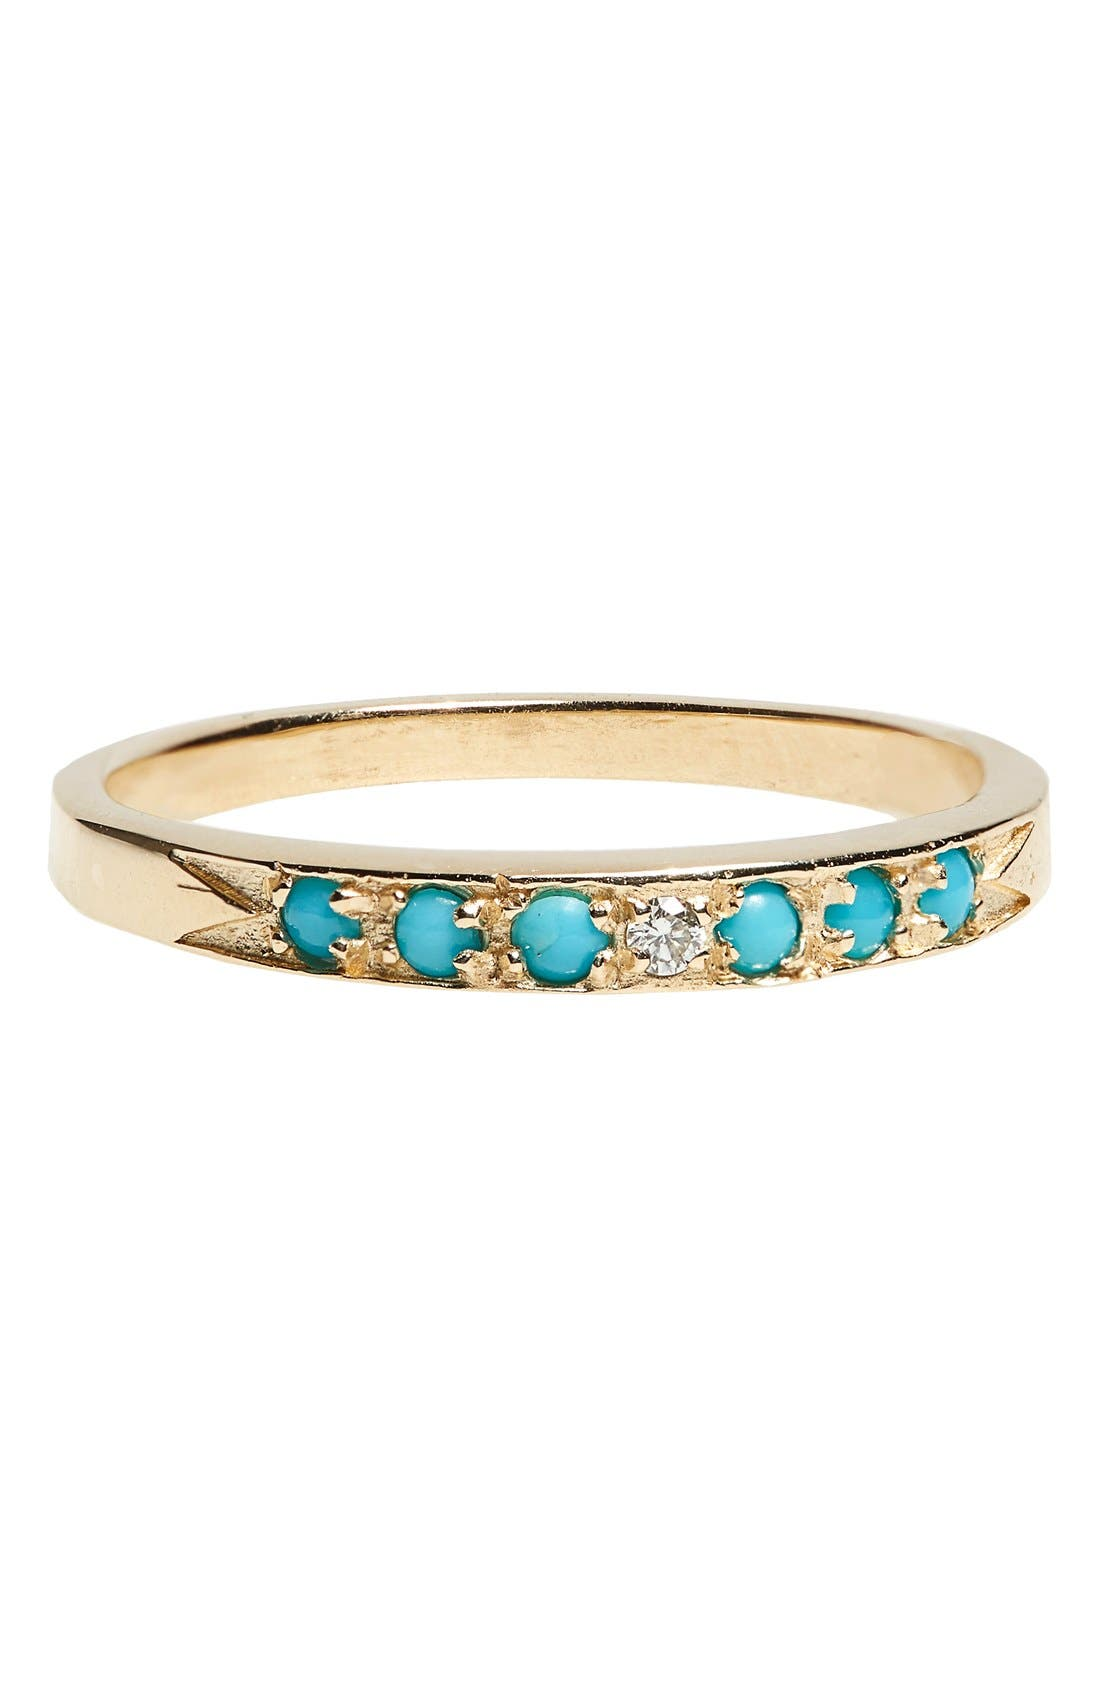 'Moon & Stars' Single Band Turquoise & Diamond Ring,                         Main,                         color, Yellow Gold